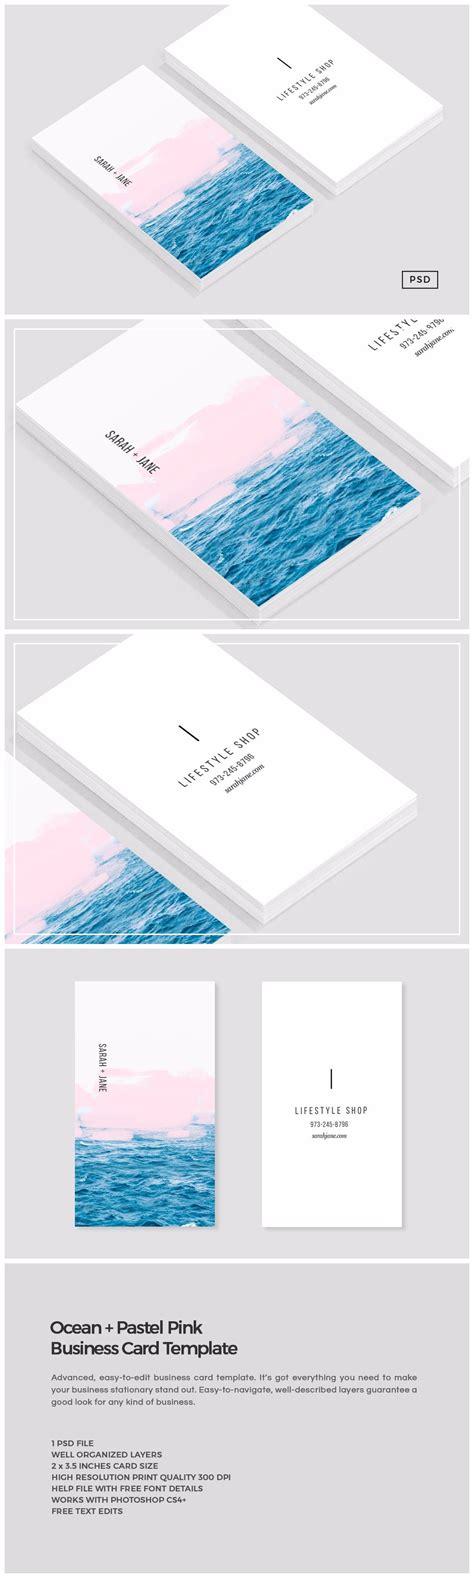 pink business card template business card templates creative market